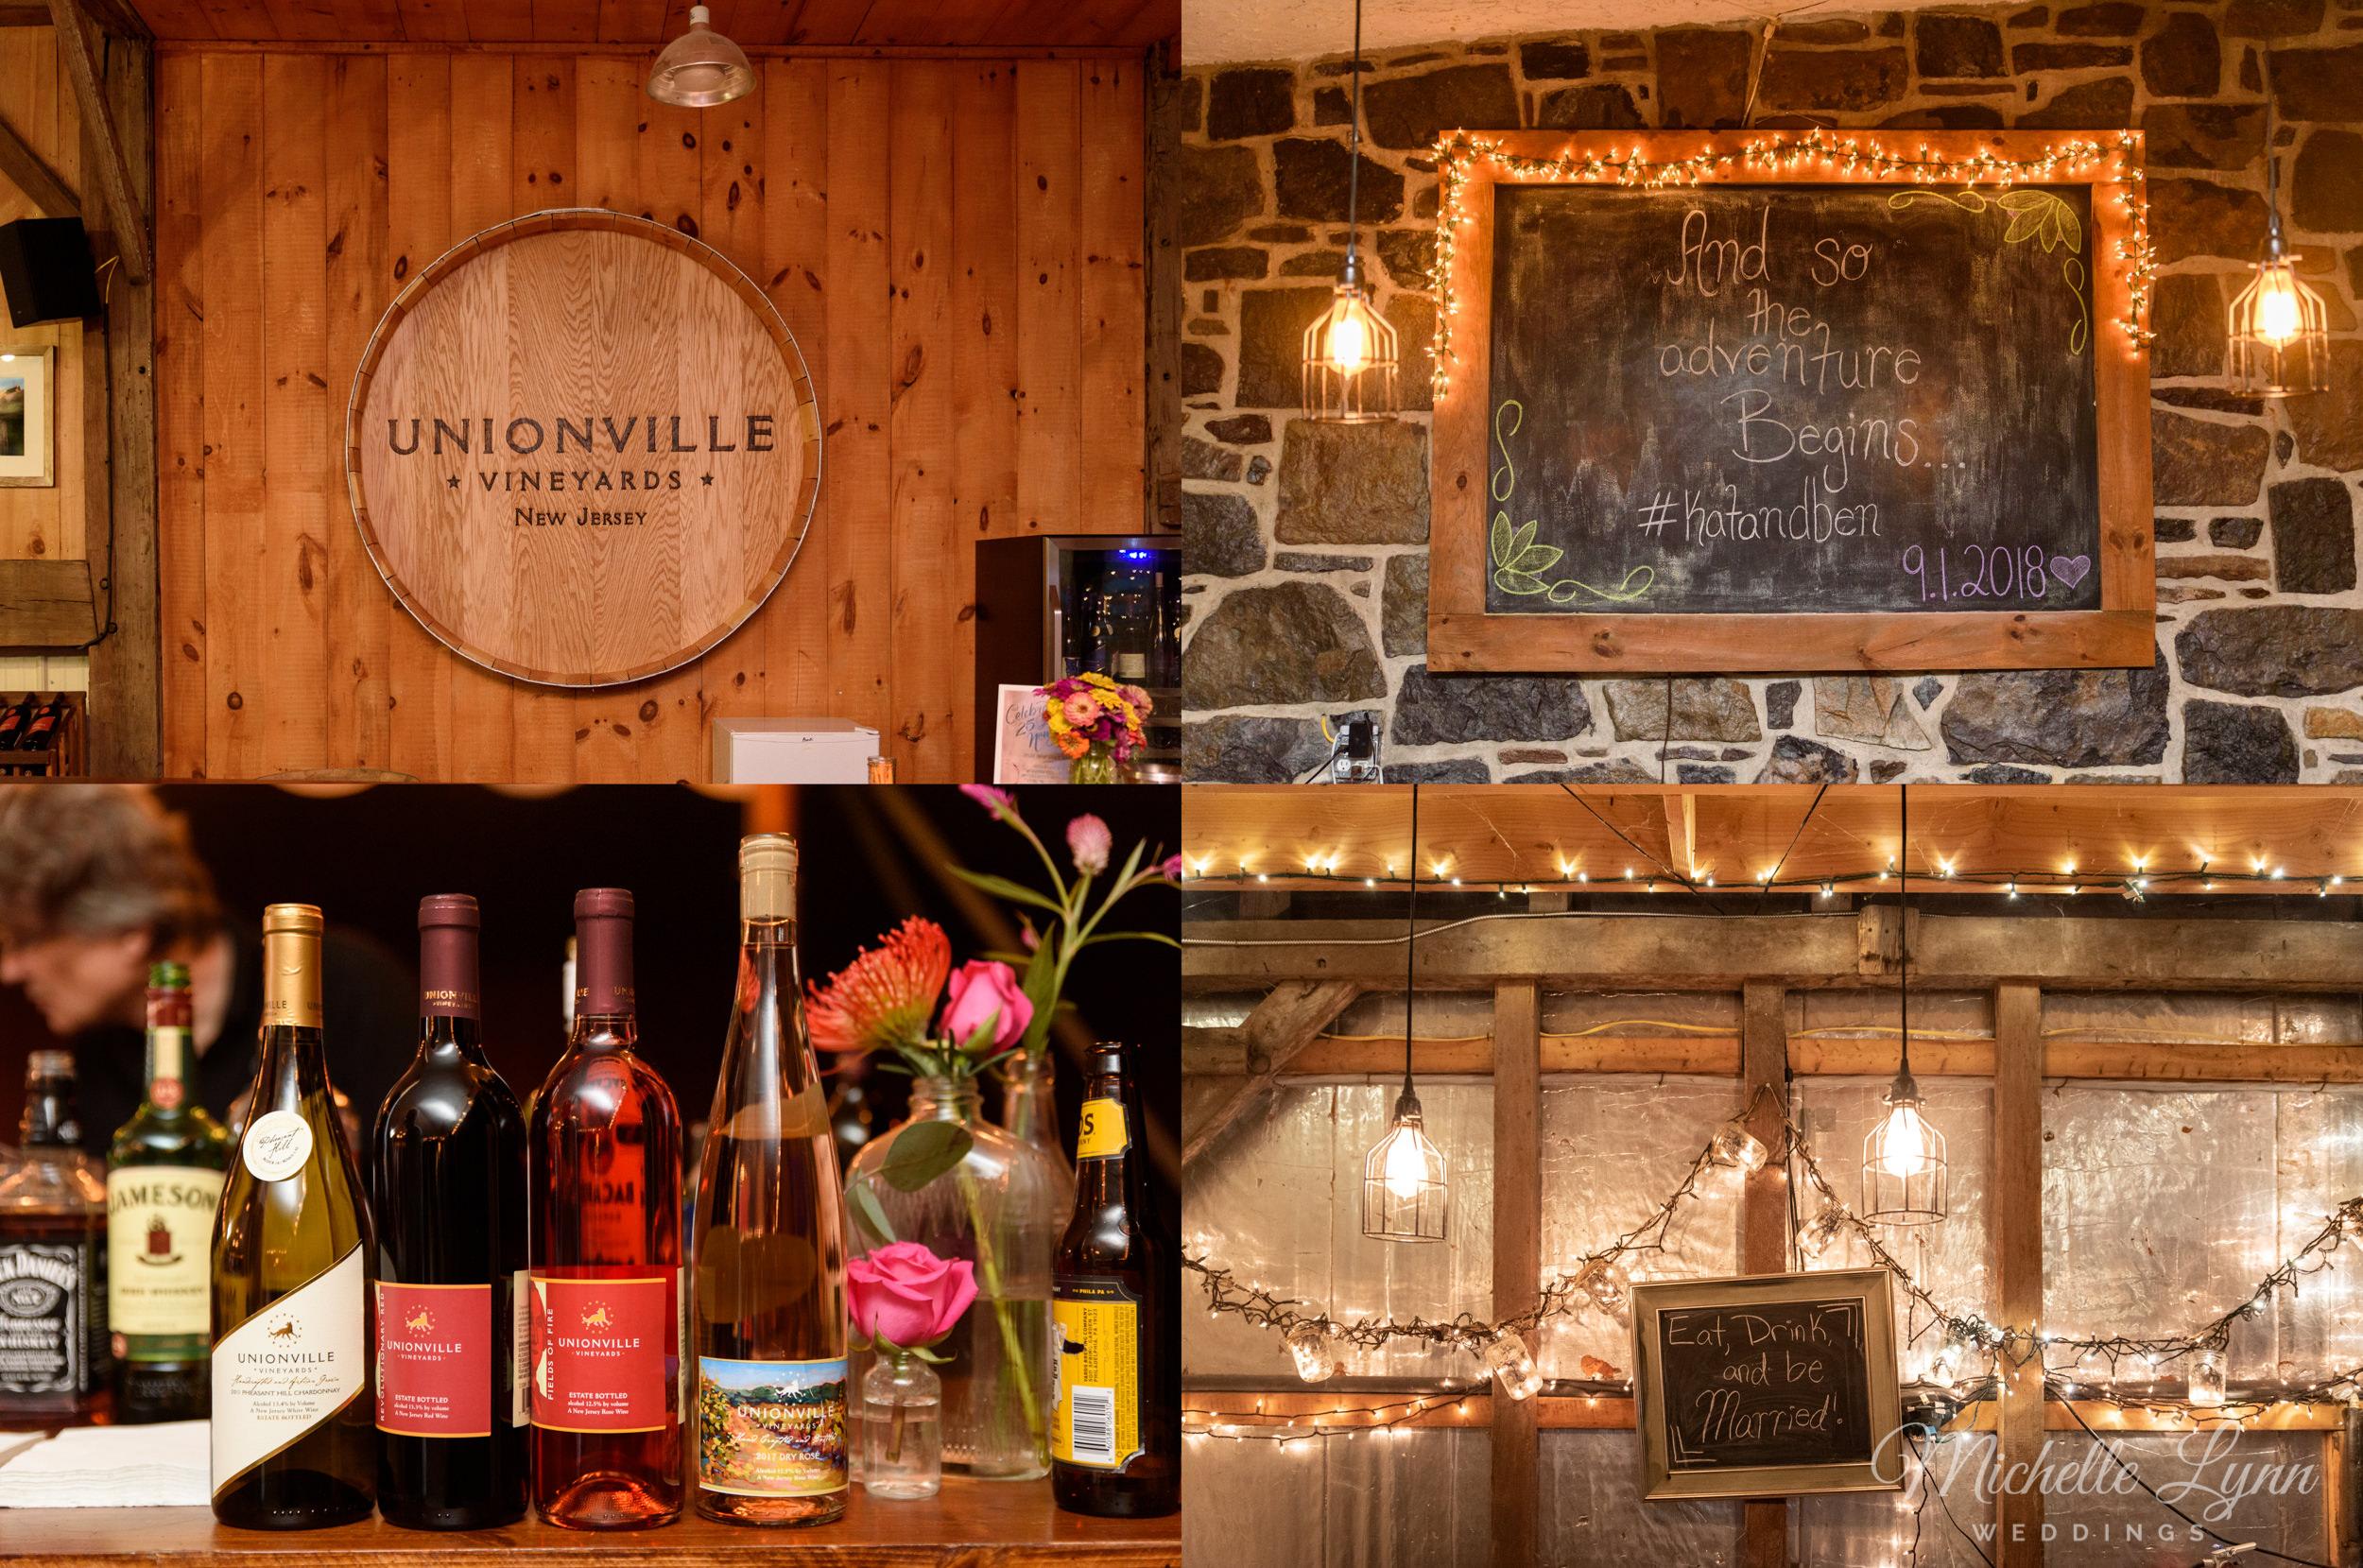 mlw-unionville-vineyards-nj-wedding-photography-108.jpg